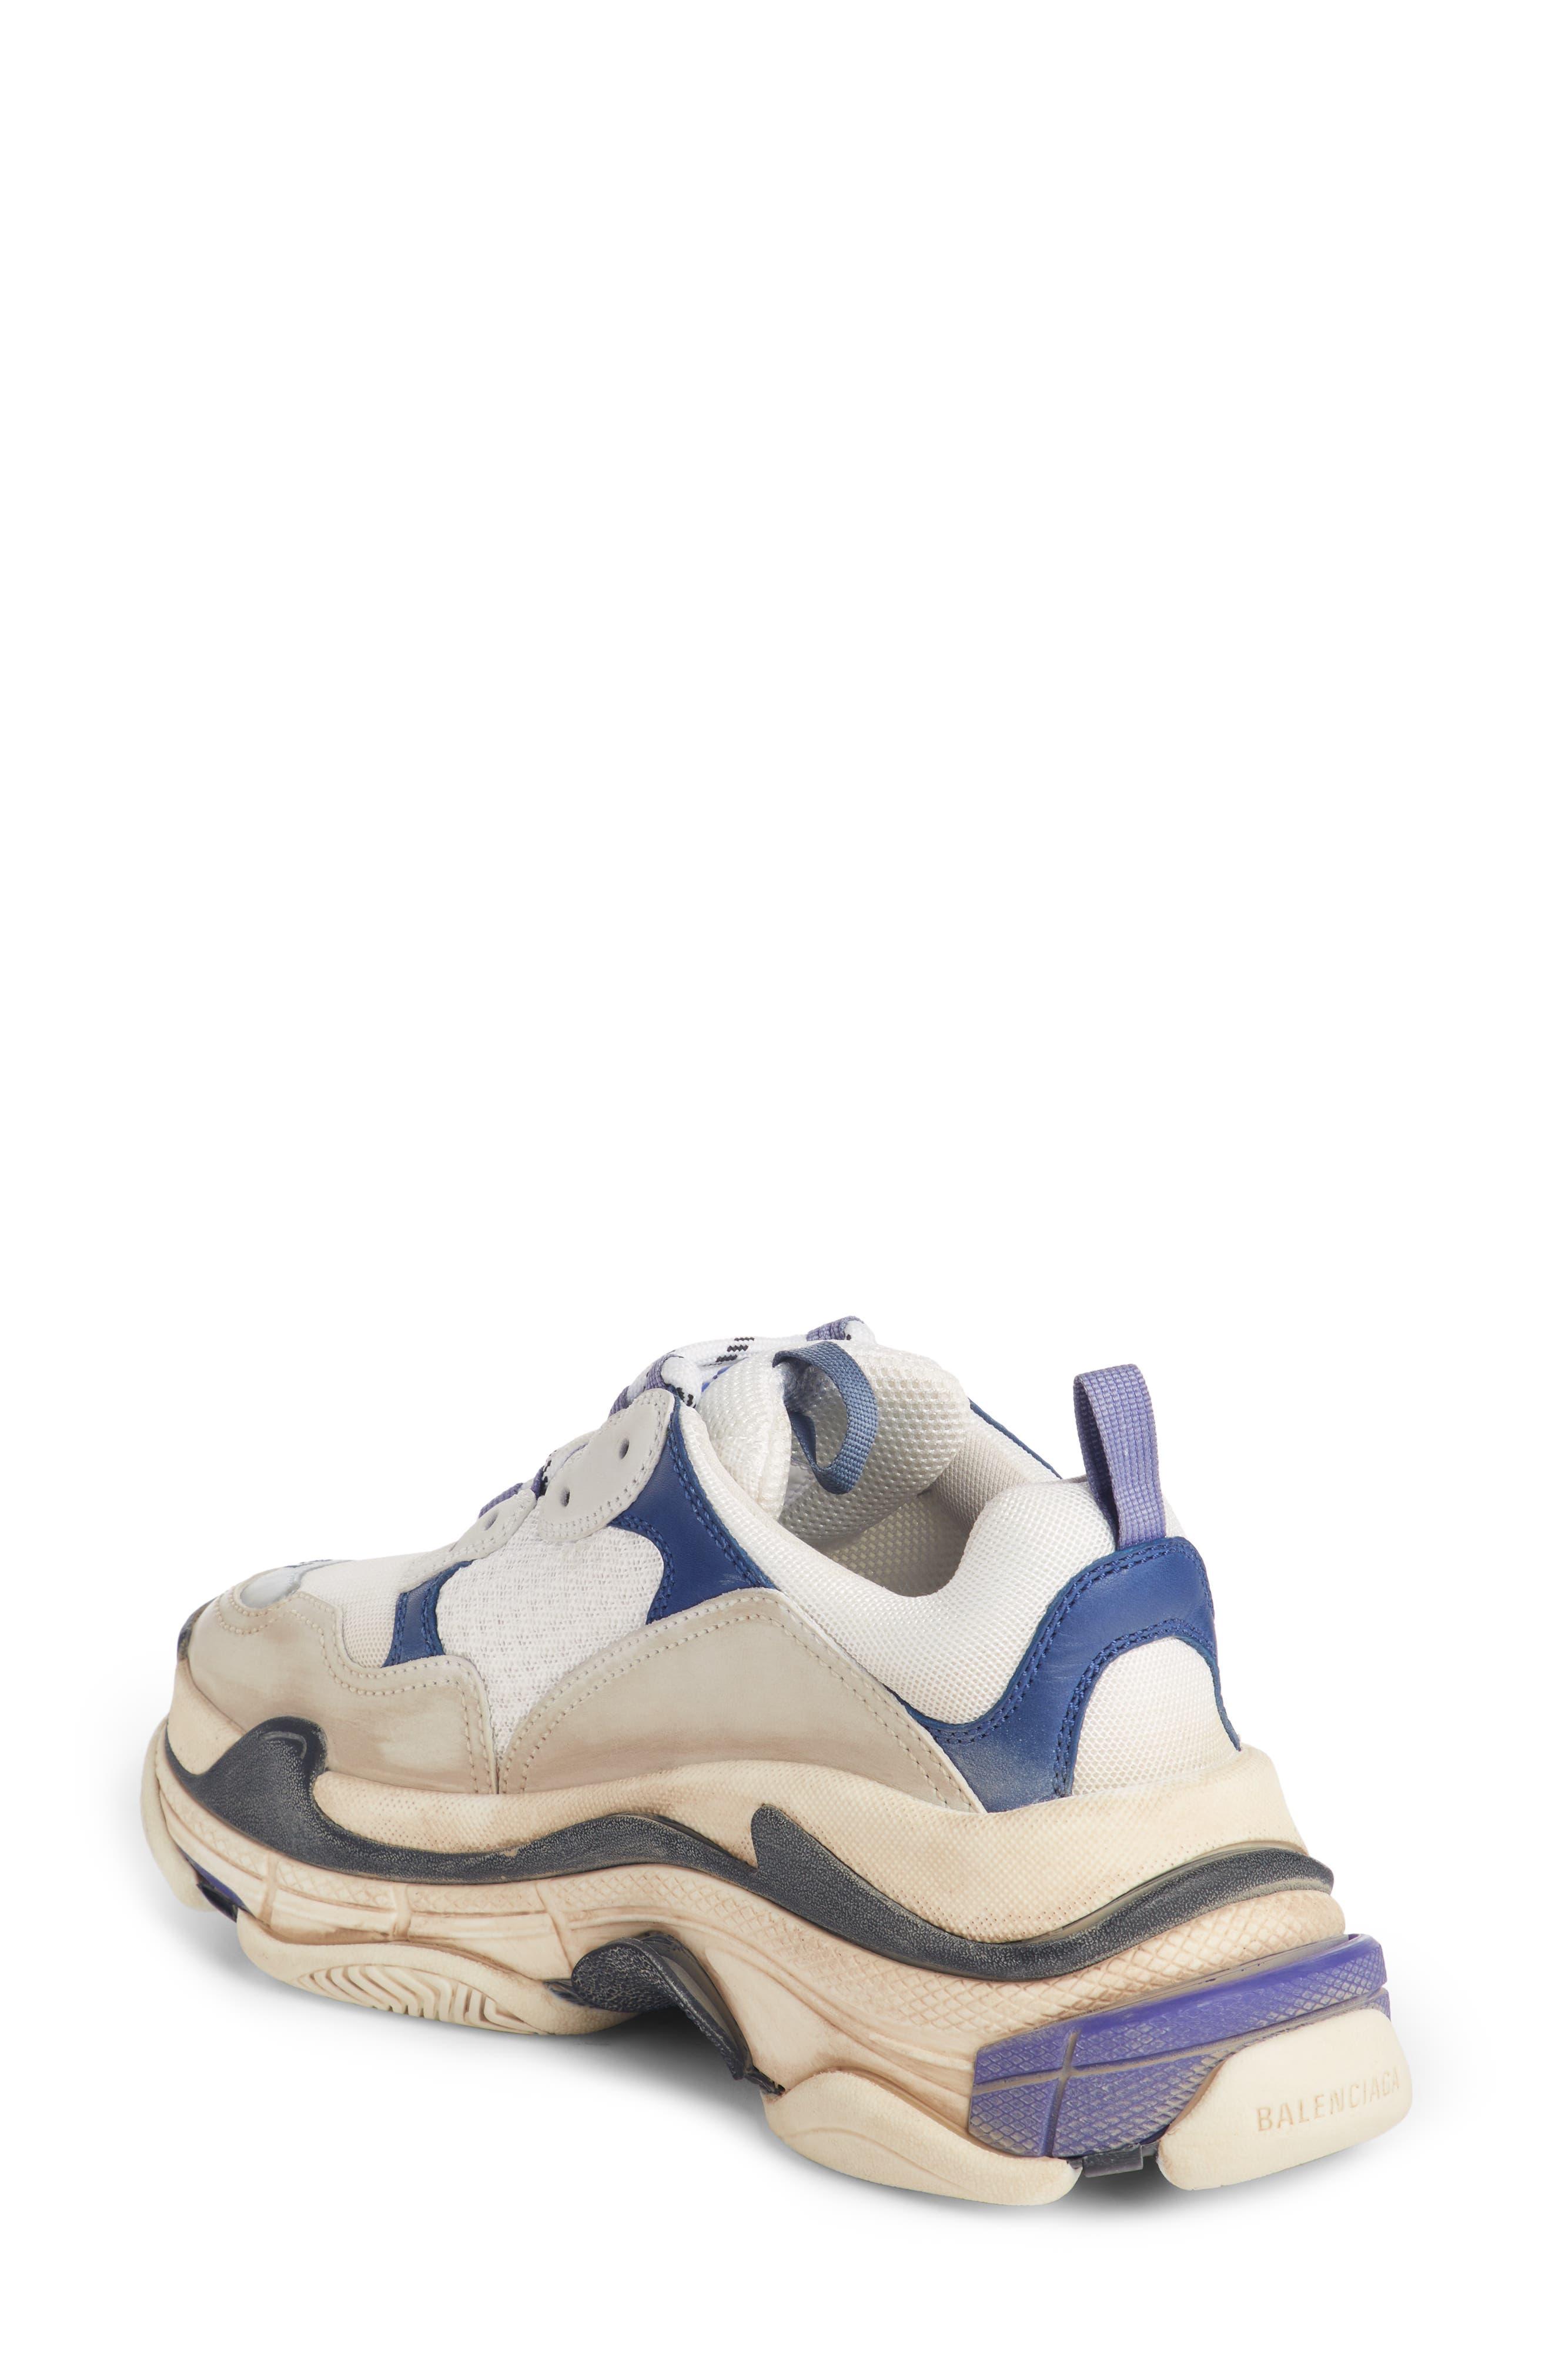 BALENCIAGA, Triple S Sneaker, Alternate thumbnail 2, color, VIOLET/ WHITE/ BLUE